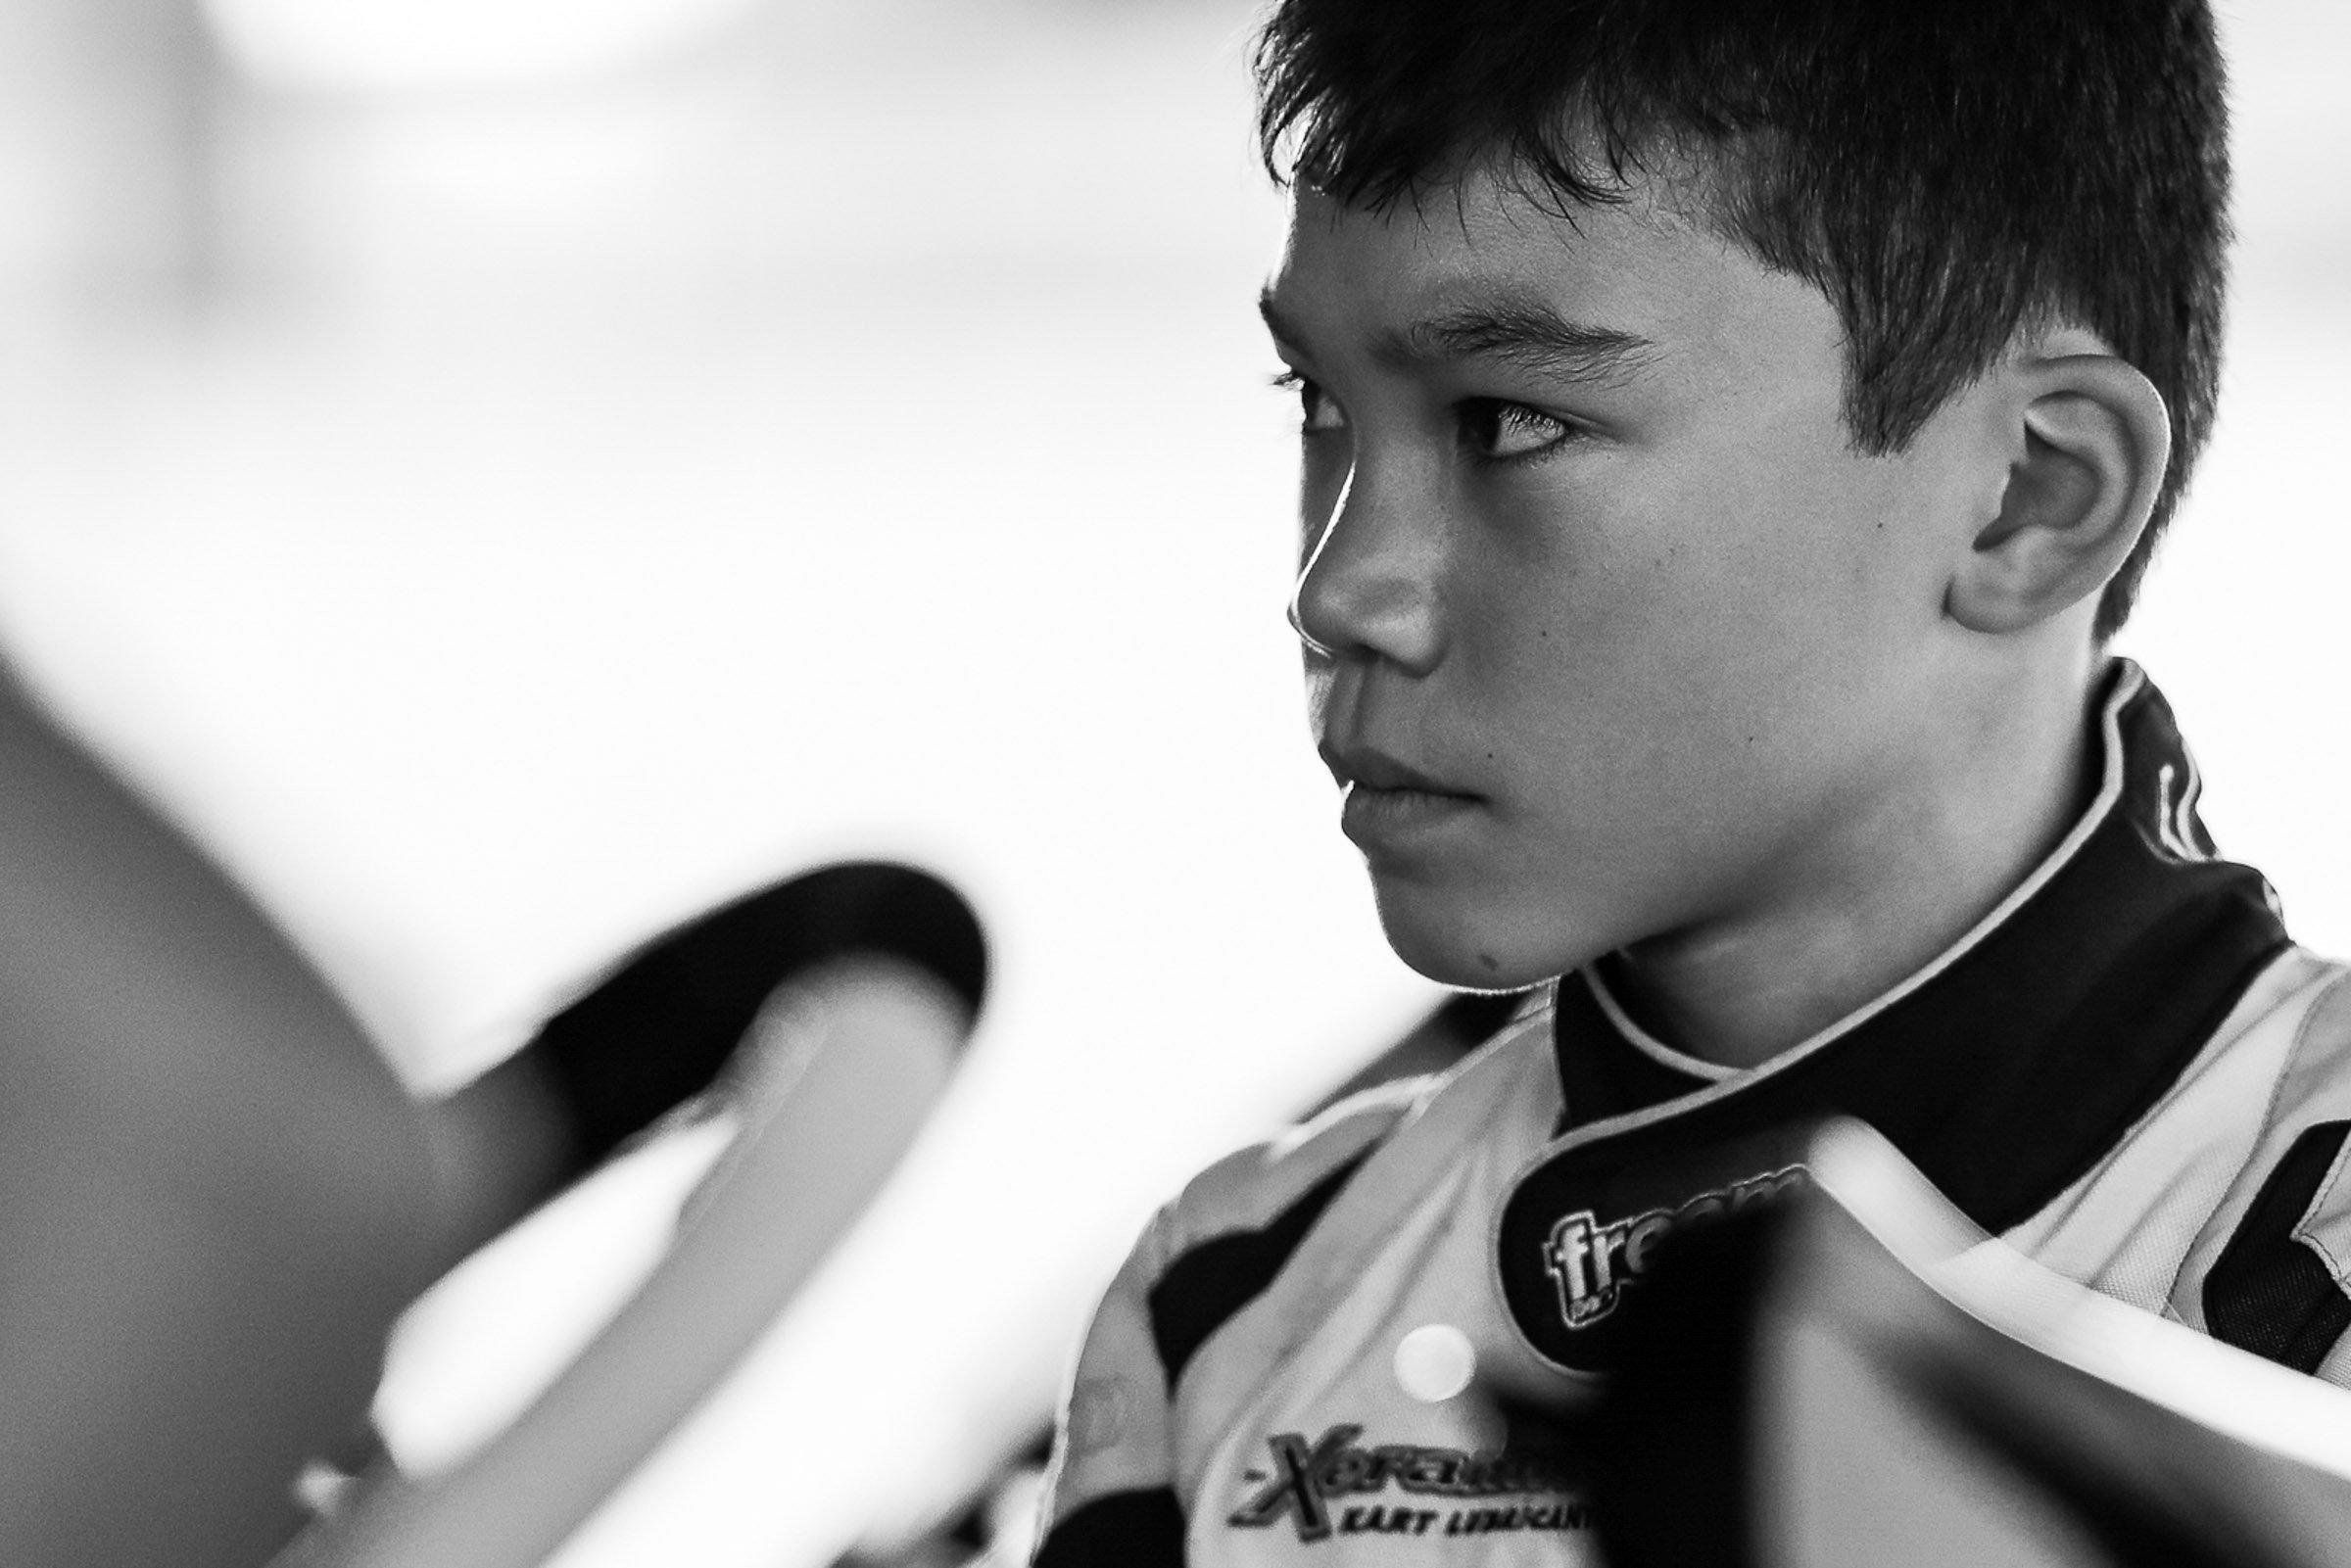 Photo by Alexandros Vernardis / The Racebox